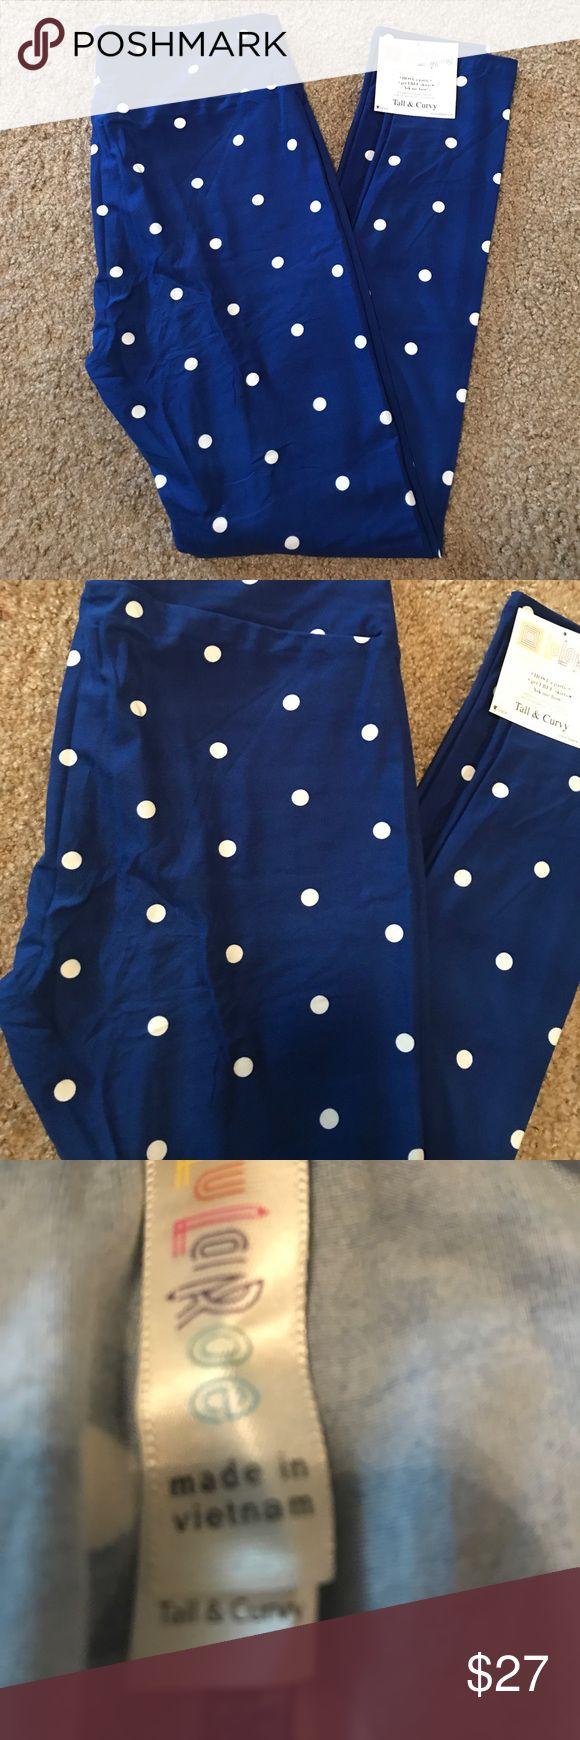 NWT Lularoe TC leggings New Lularoe tall @ curvy leggings, these fit on the lower end of the sizing chart.  Royal blue background with white polka dots. LuLaRoe Pants Leggings